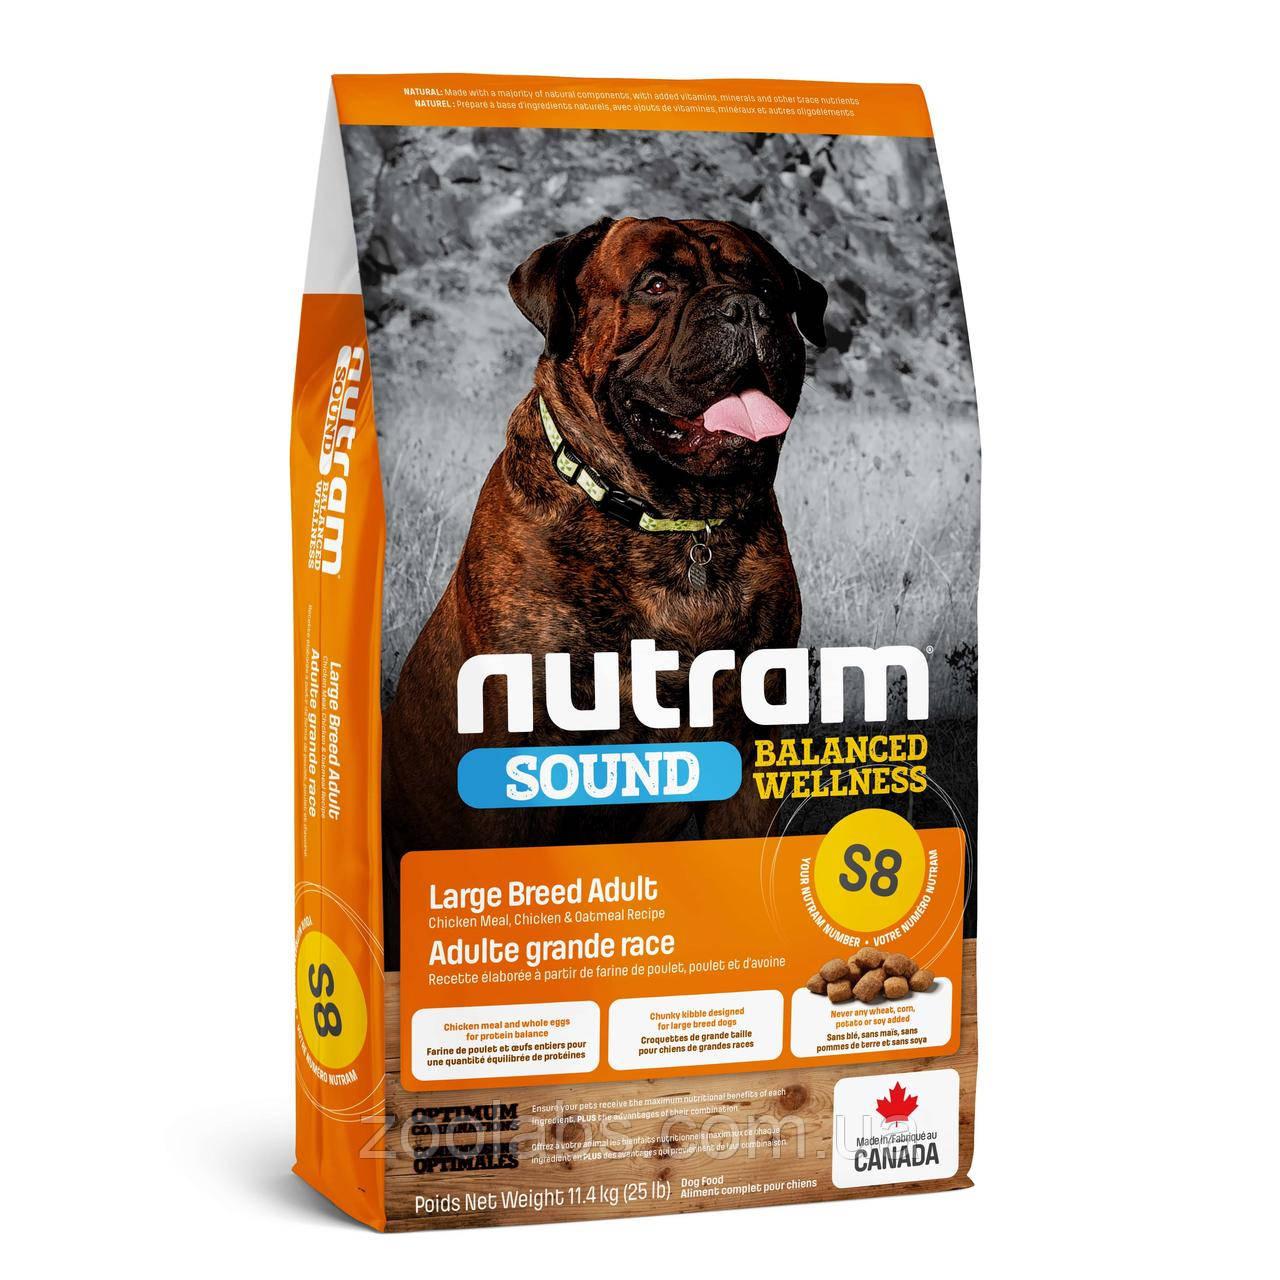 Корм Nutram для собак с курицей | Nutram S8 Sound Balanced Wellness Natural Large Breed Adult Dog 20 кг